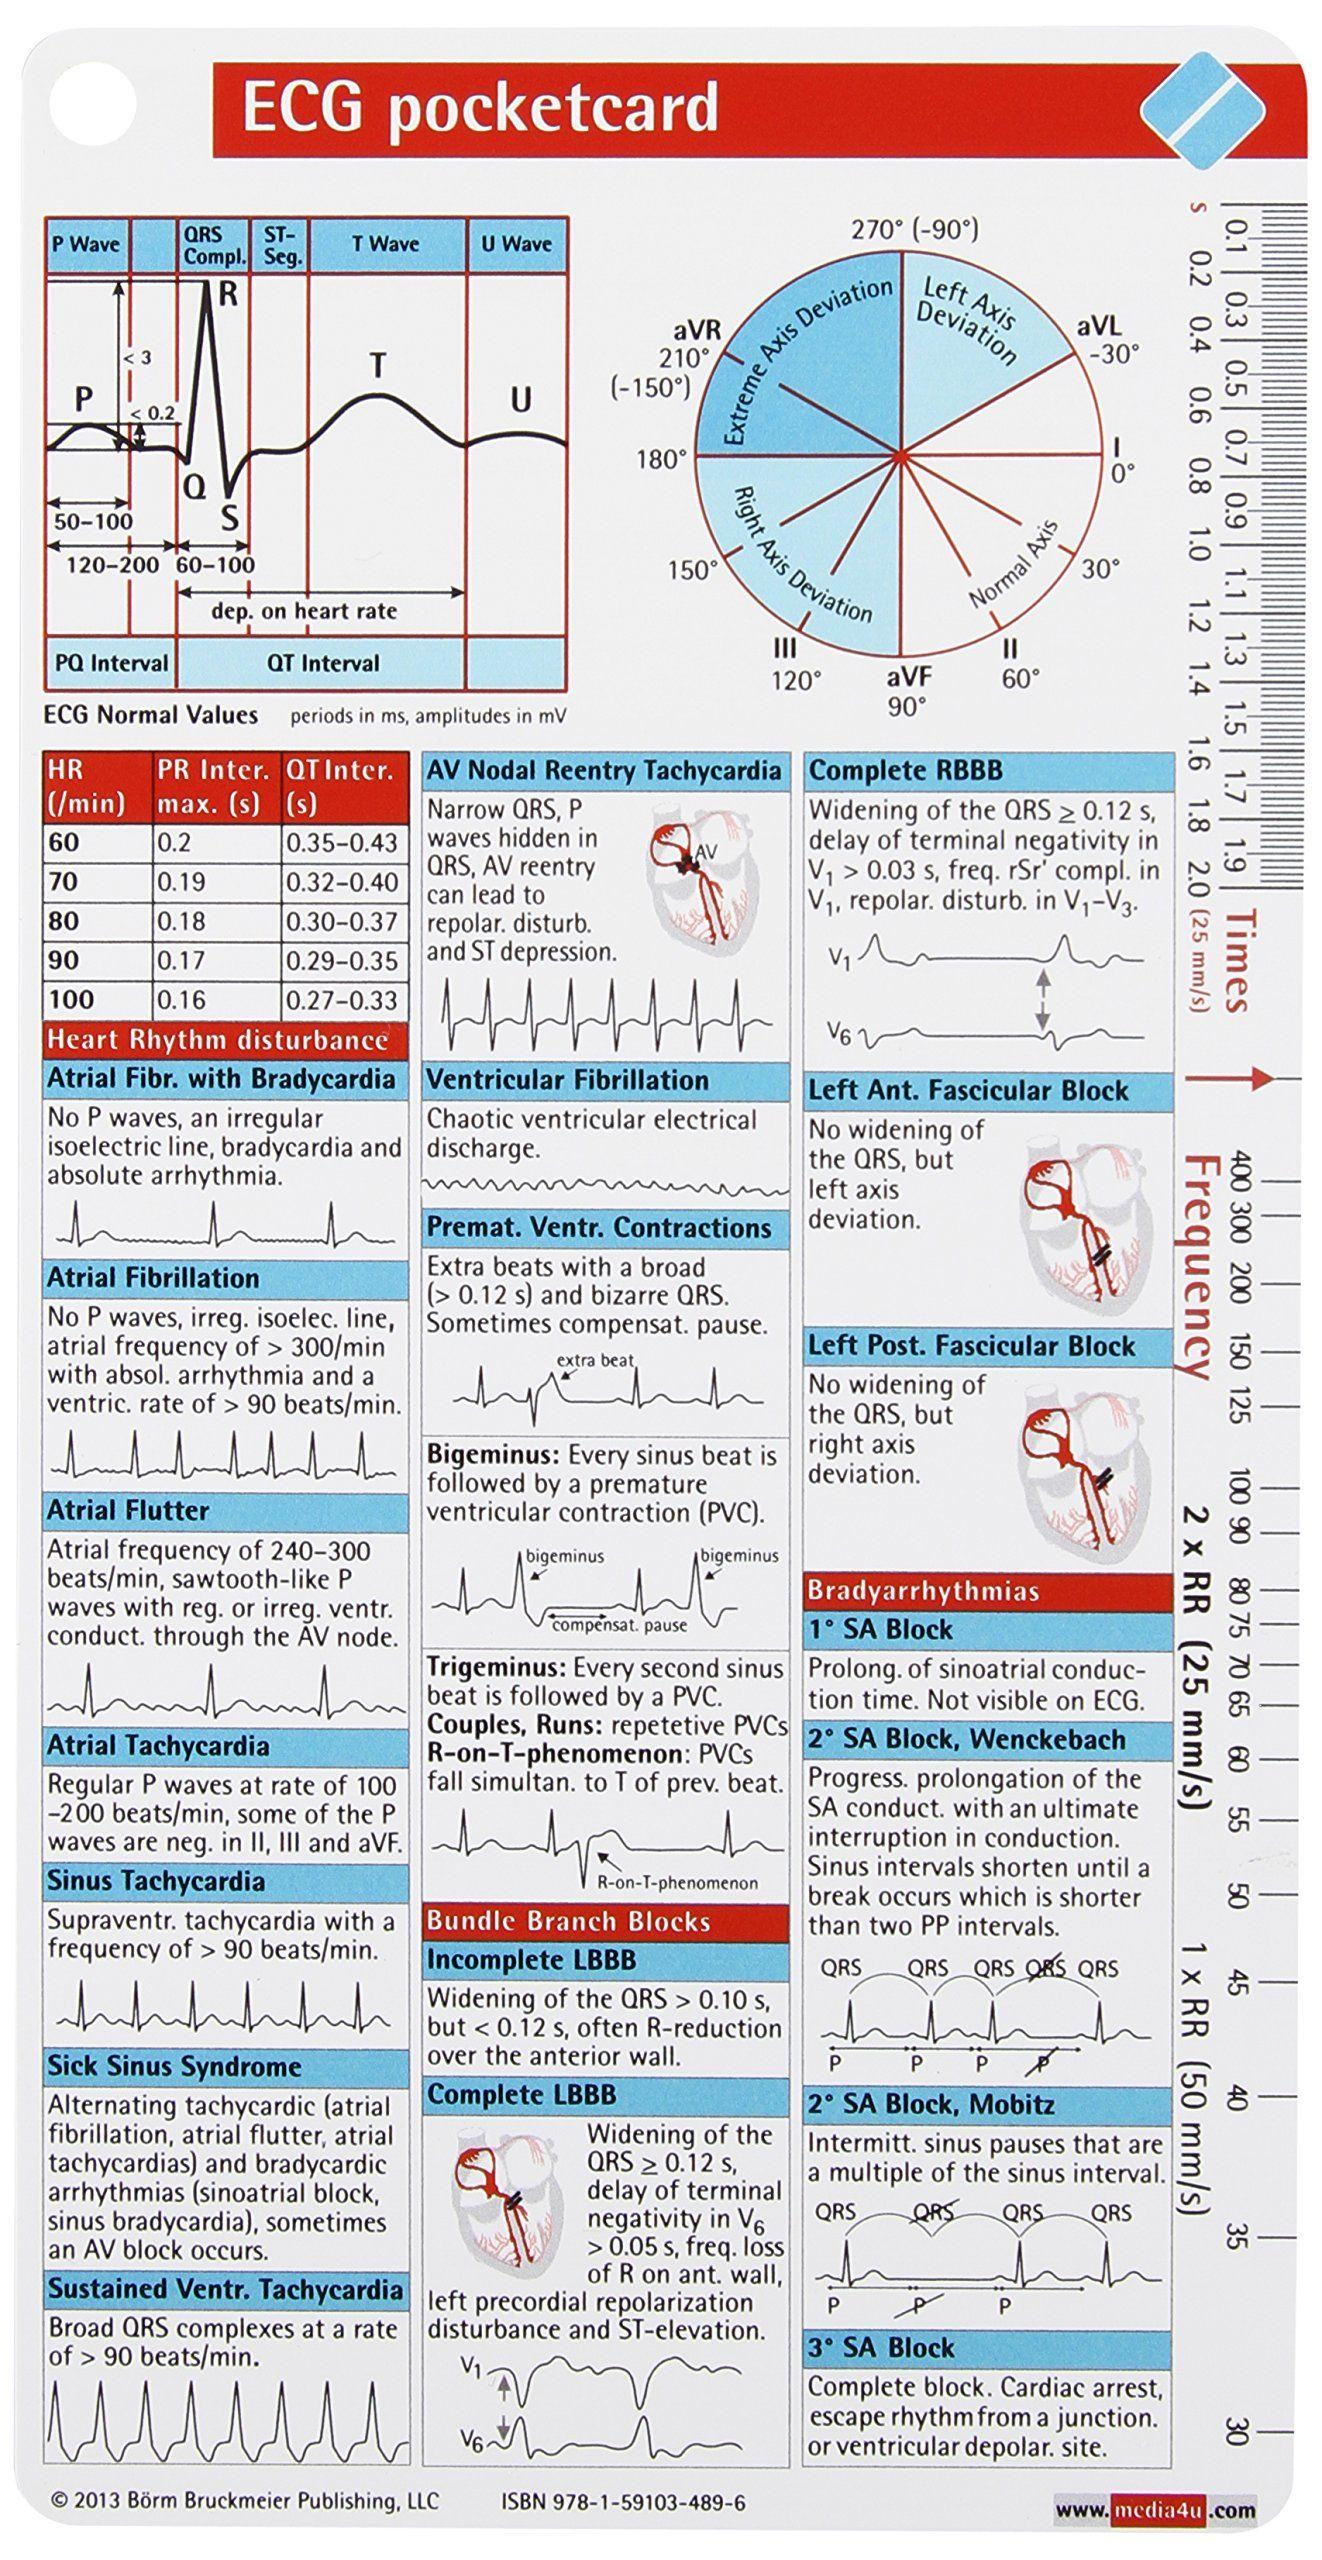 Ecg pocketcard borm 9781591034896 books amazon nursing ecg pocketcard borm 9781591034896 books amazon xflitez Choice Image